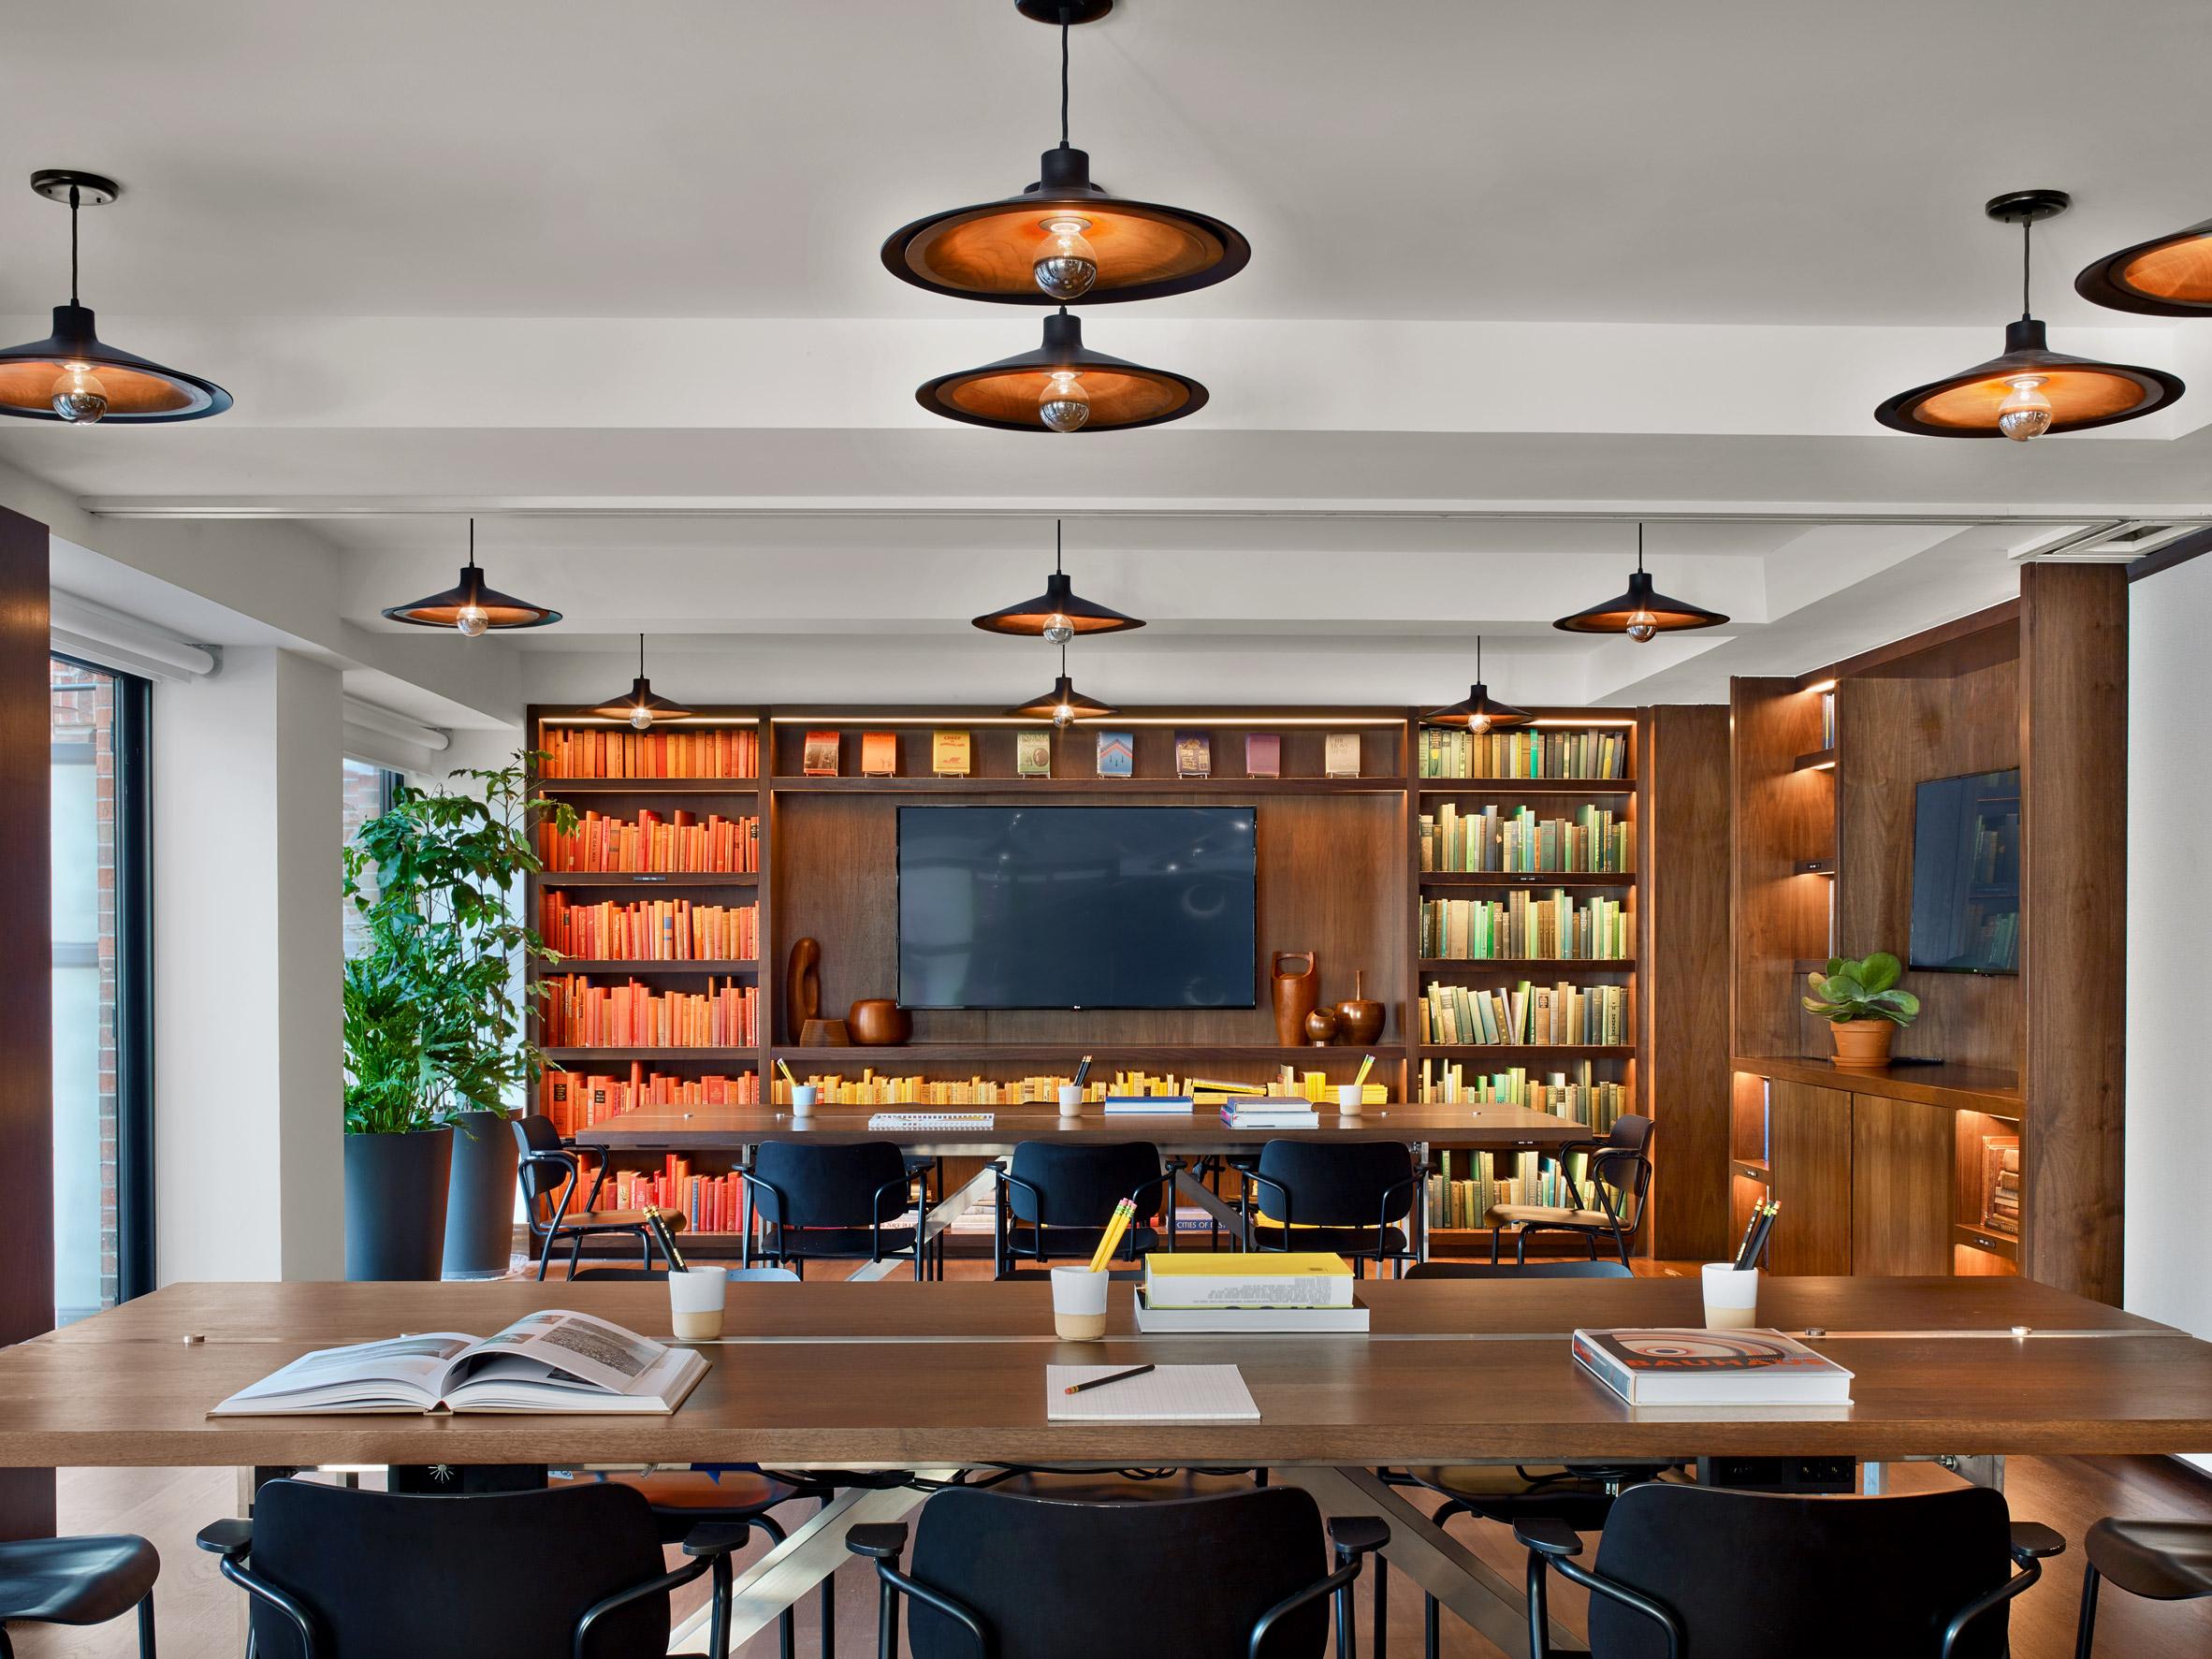 architecture-new-york-city-micro-hotel-design-studia-interiors-osnovadesign-osnova-poltava_03